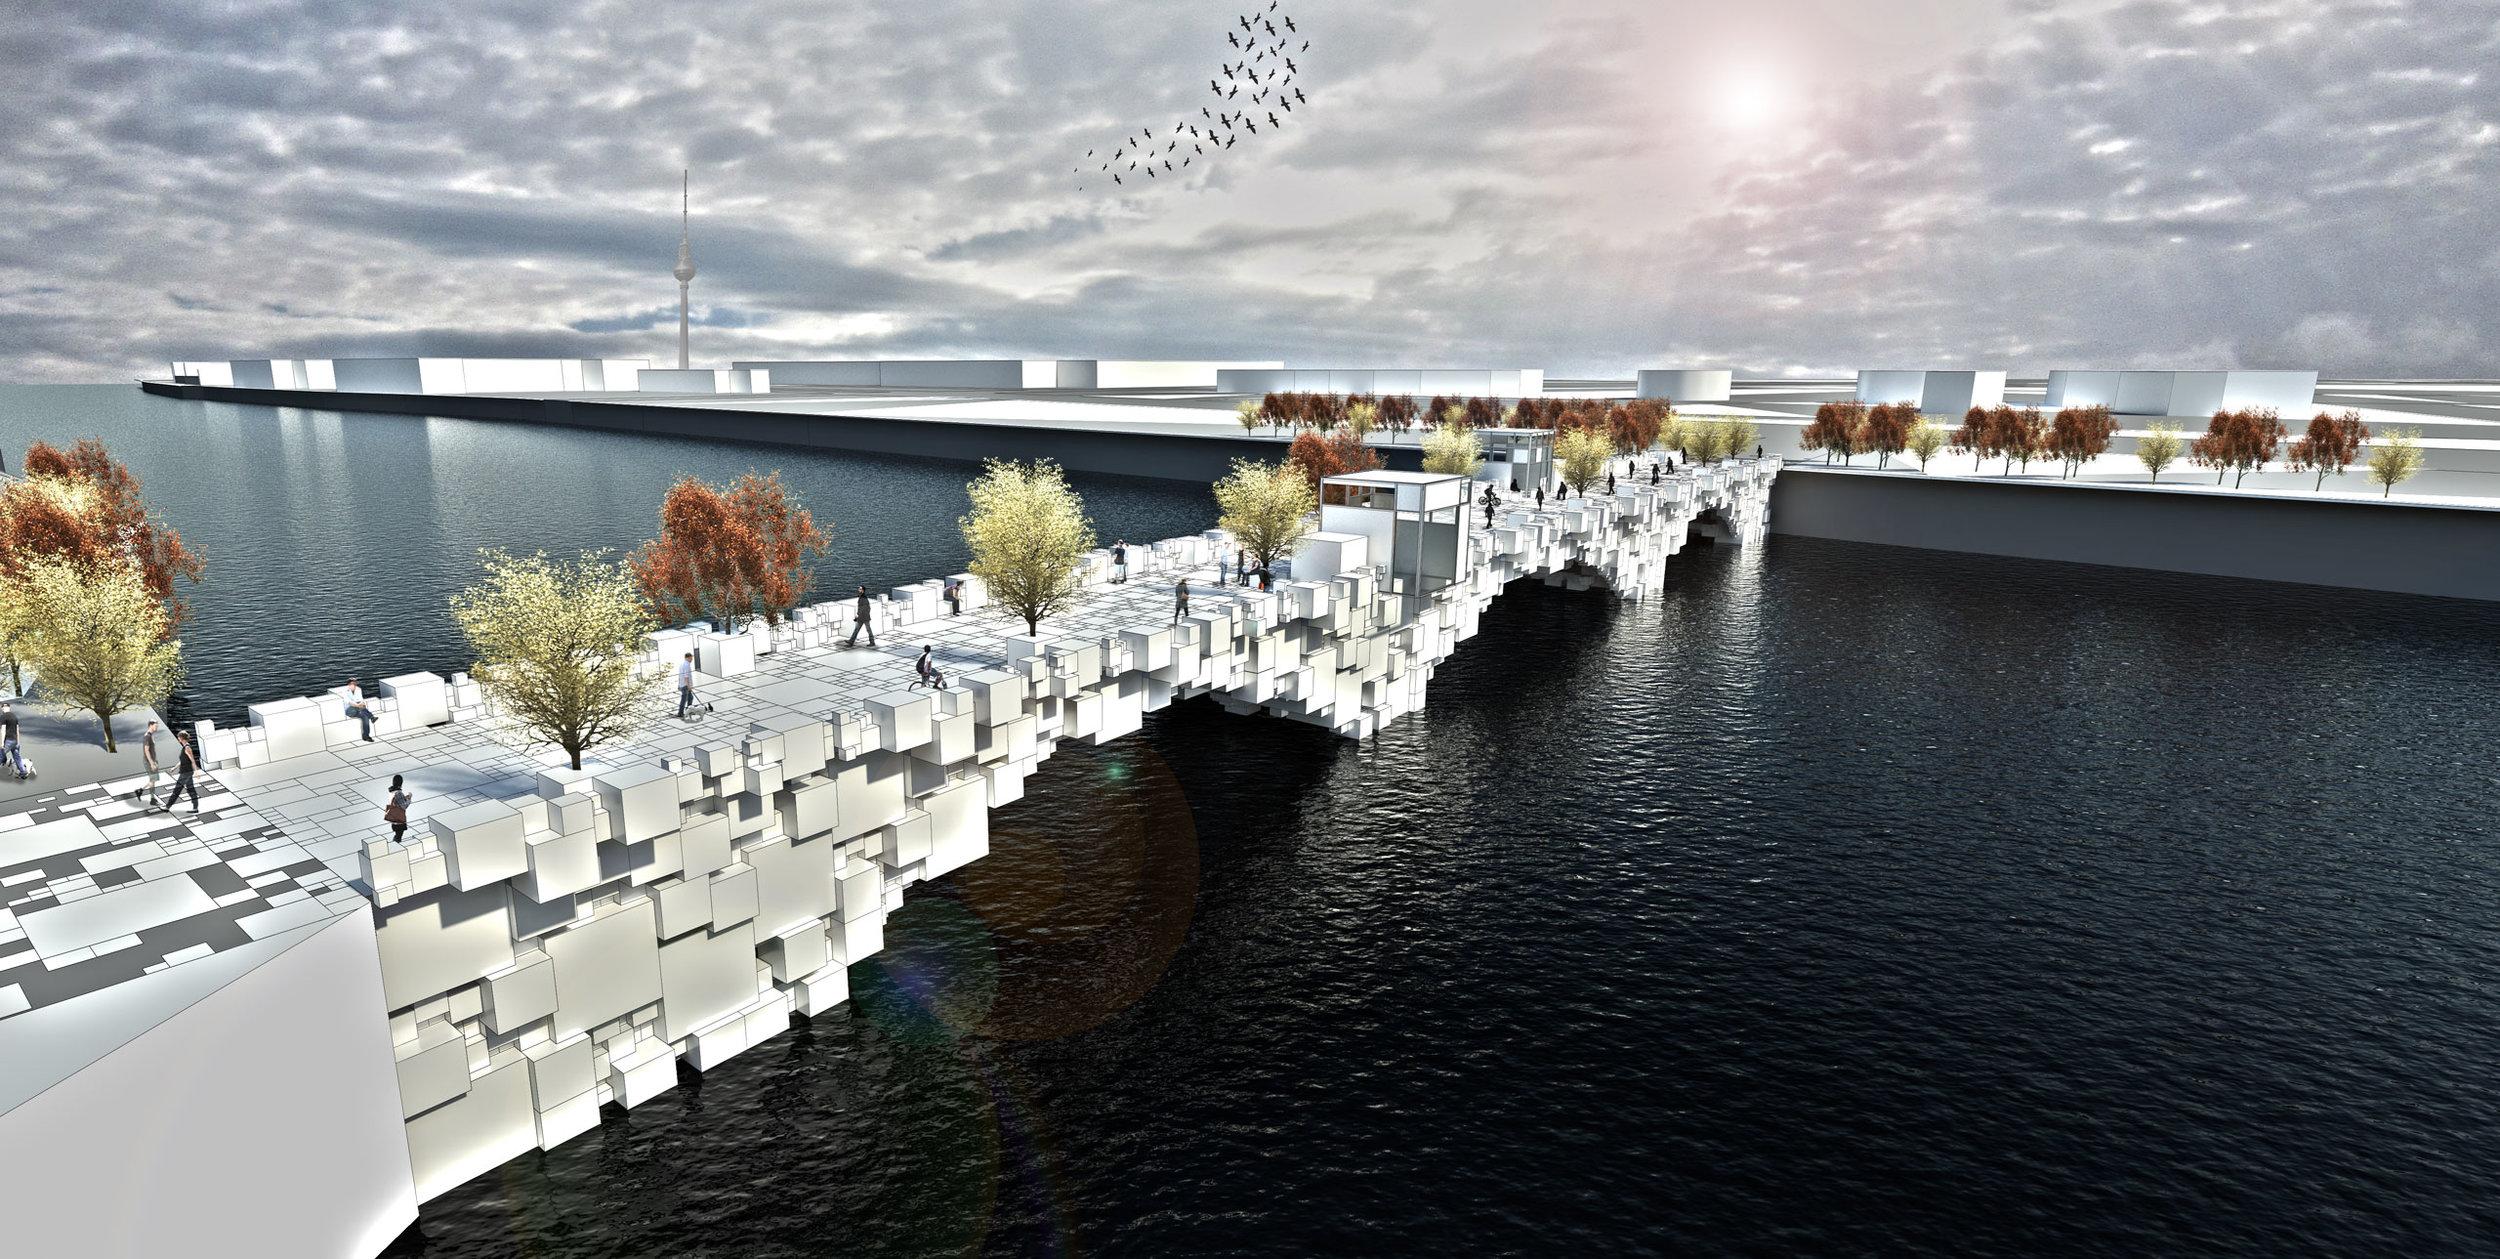 ArchTriumph - Berlin Pedestrian Bridge Competition